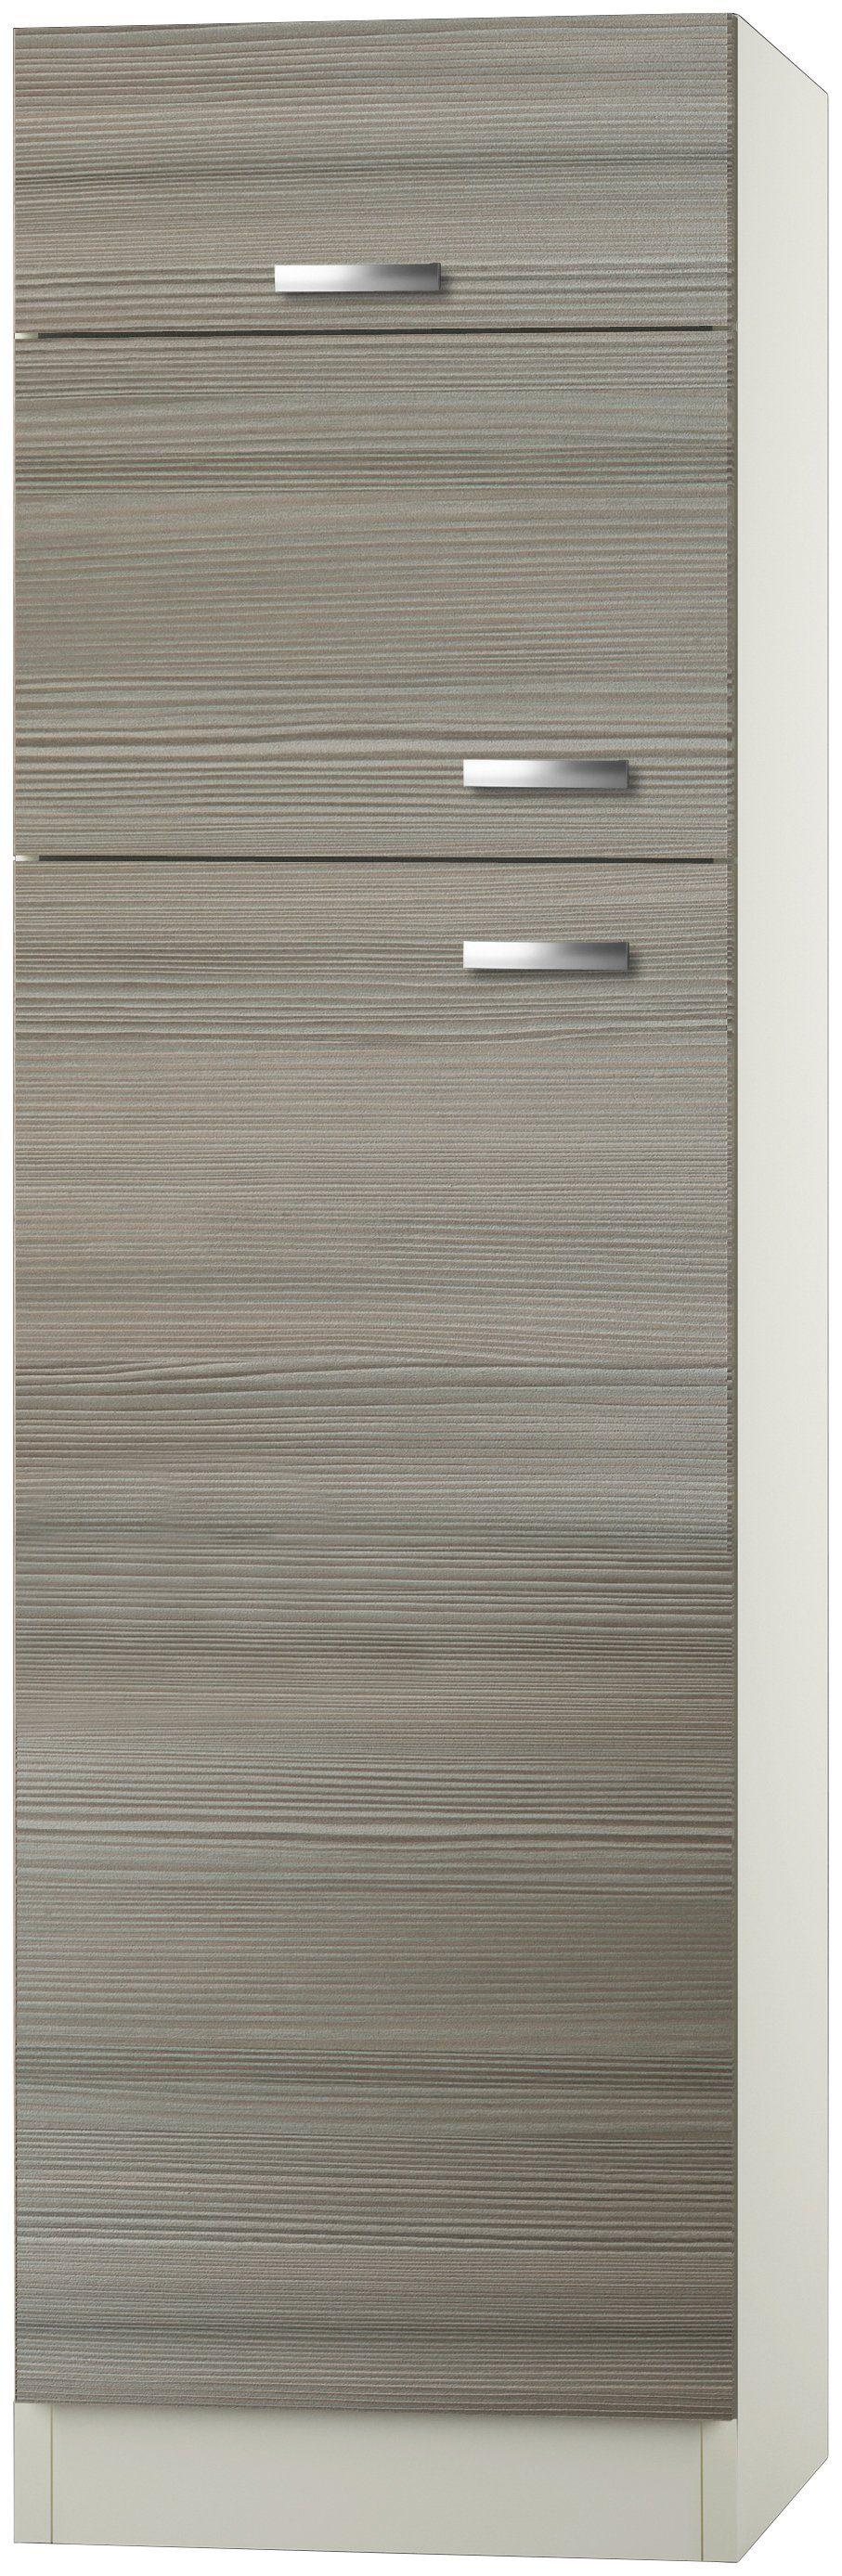 Kühlumbauschrank »Vigo, Höhe 206,8 cm«, Breite 60 cm